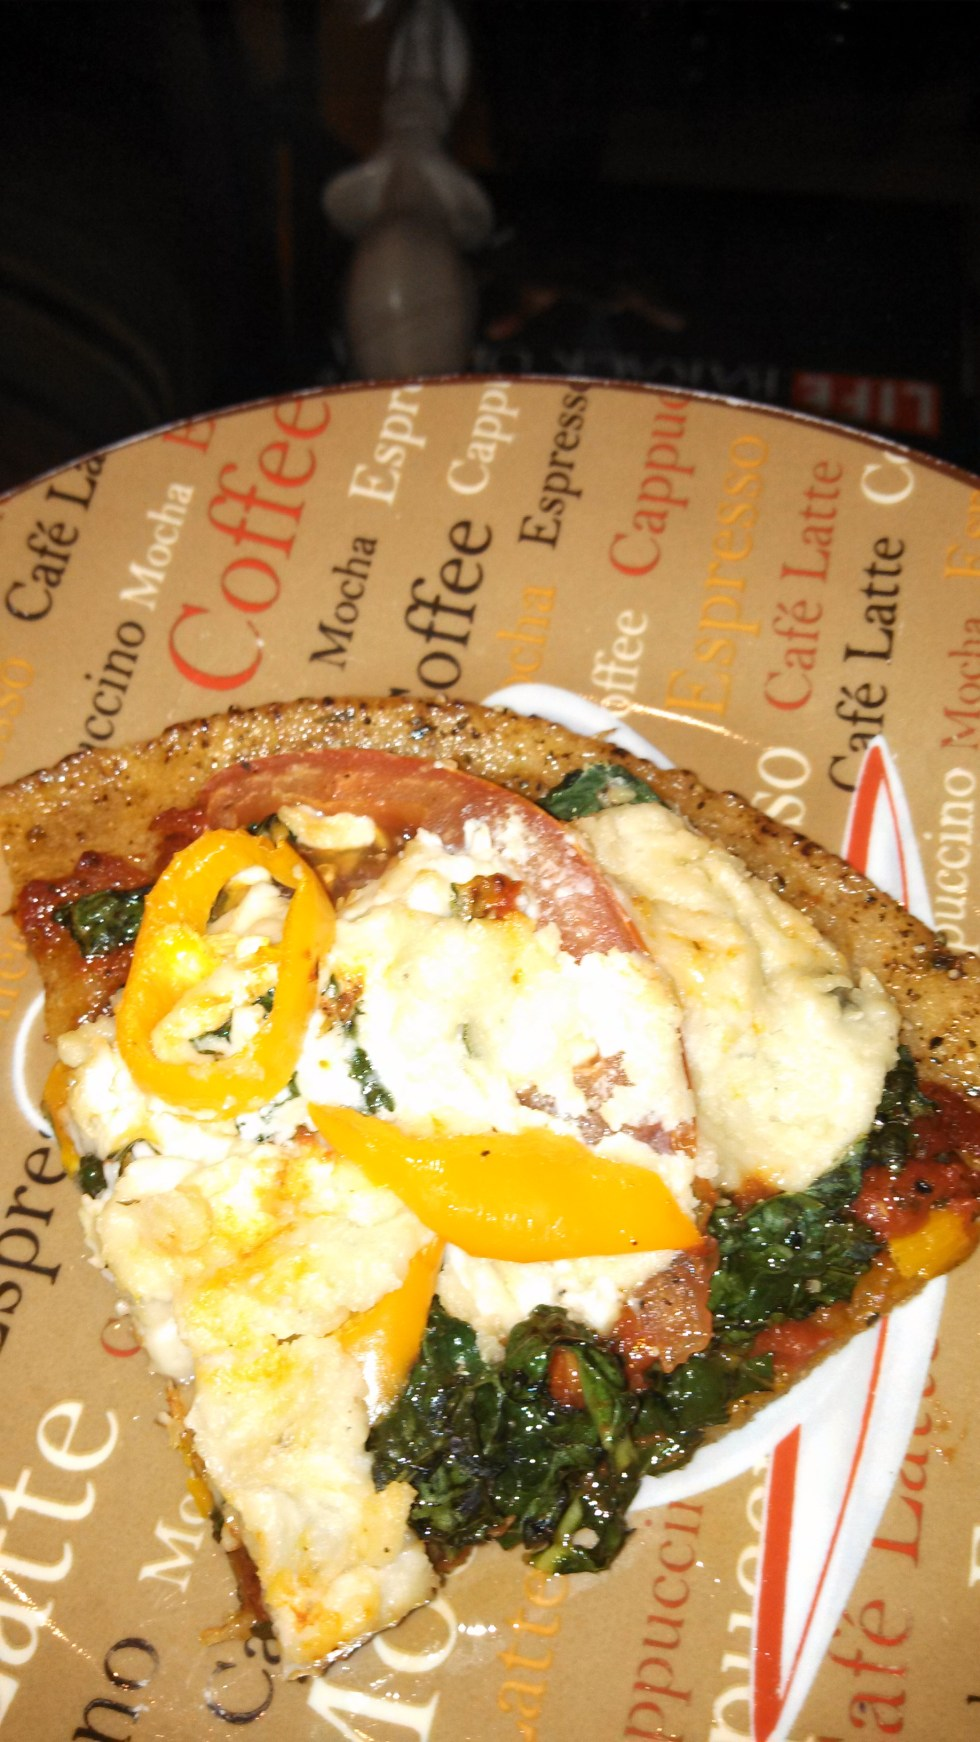 Homemade Chickpea Flatbread Pizza